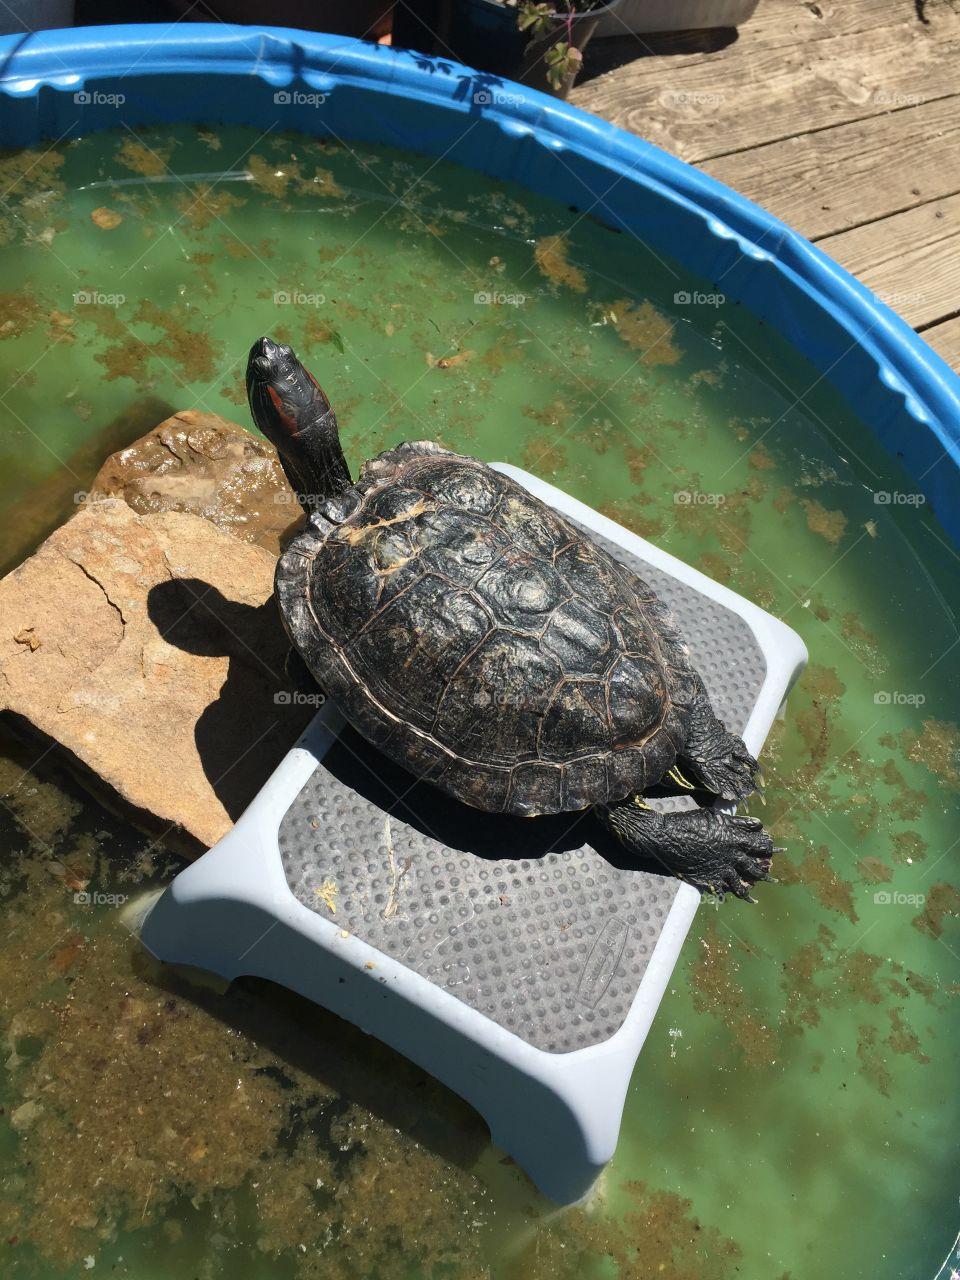 Pet turtle sunning